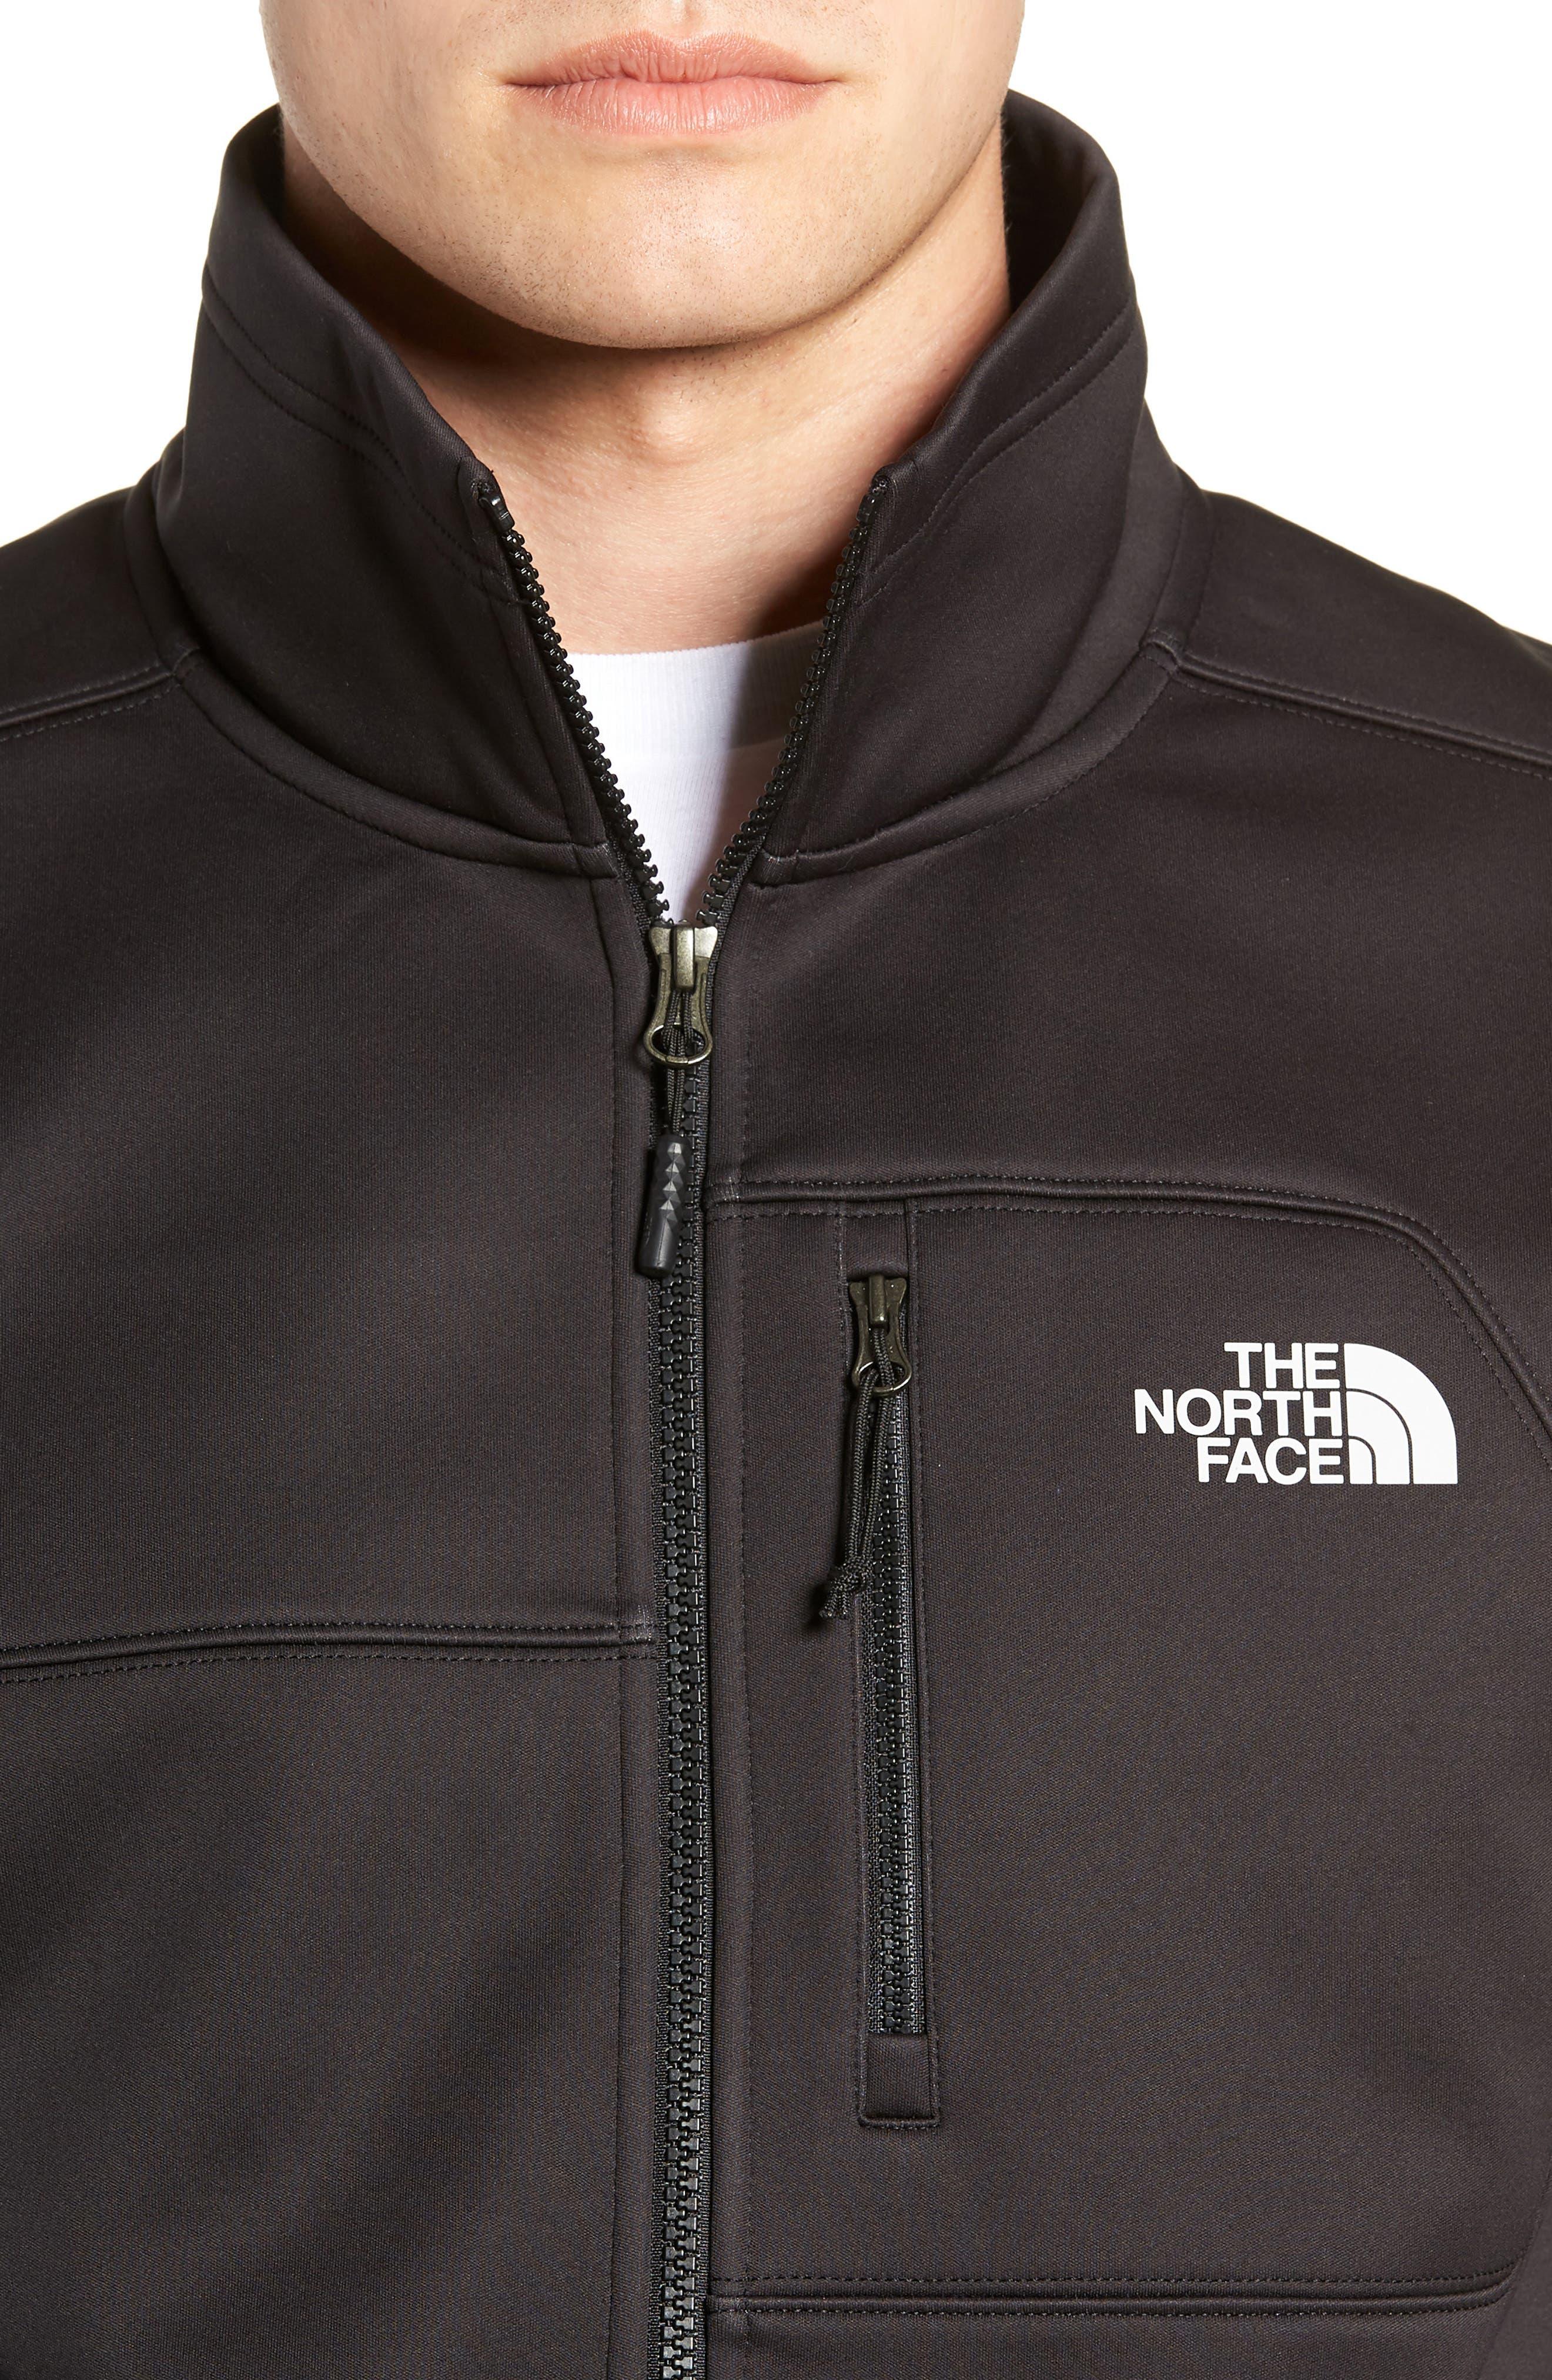 Apex Risor Jacket,                             Alternate thumbnail 4, color,                             TNF BLACK/ TNF BLACK